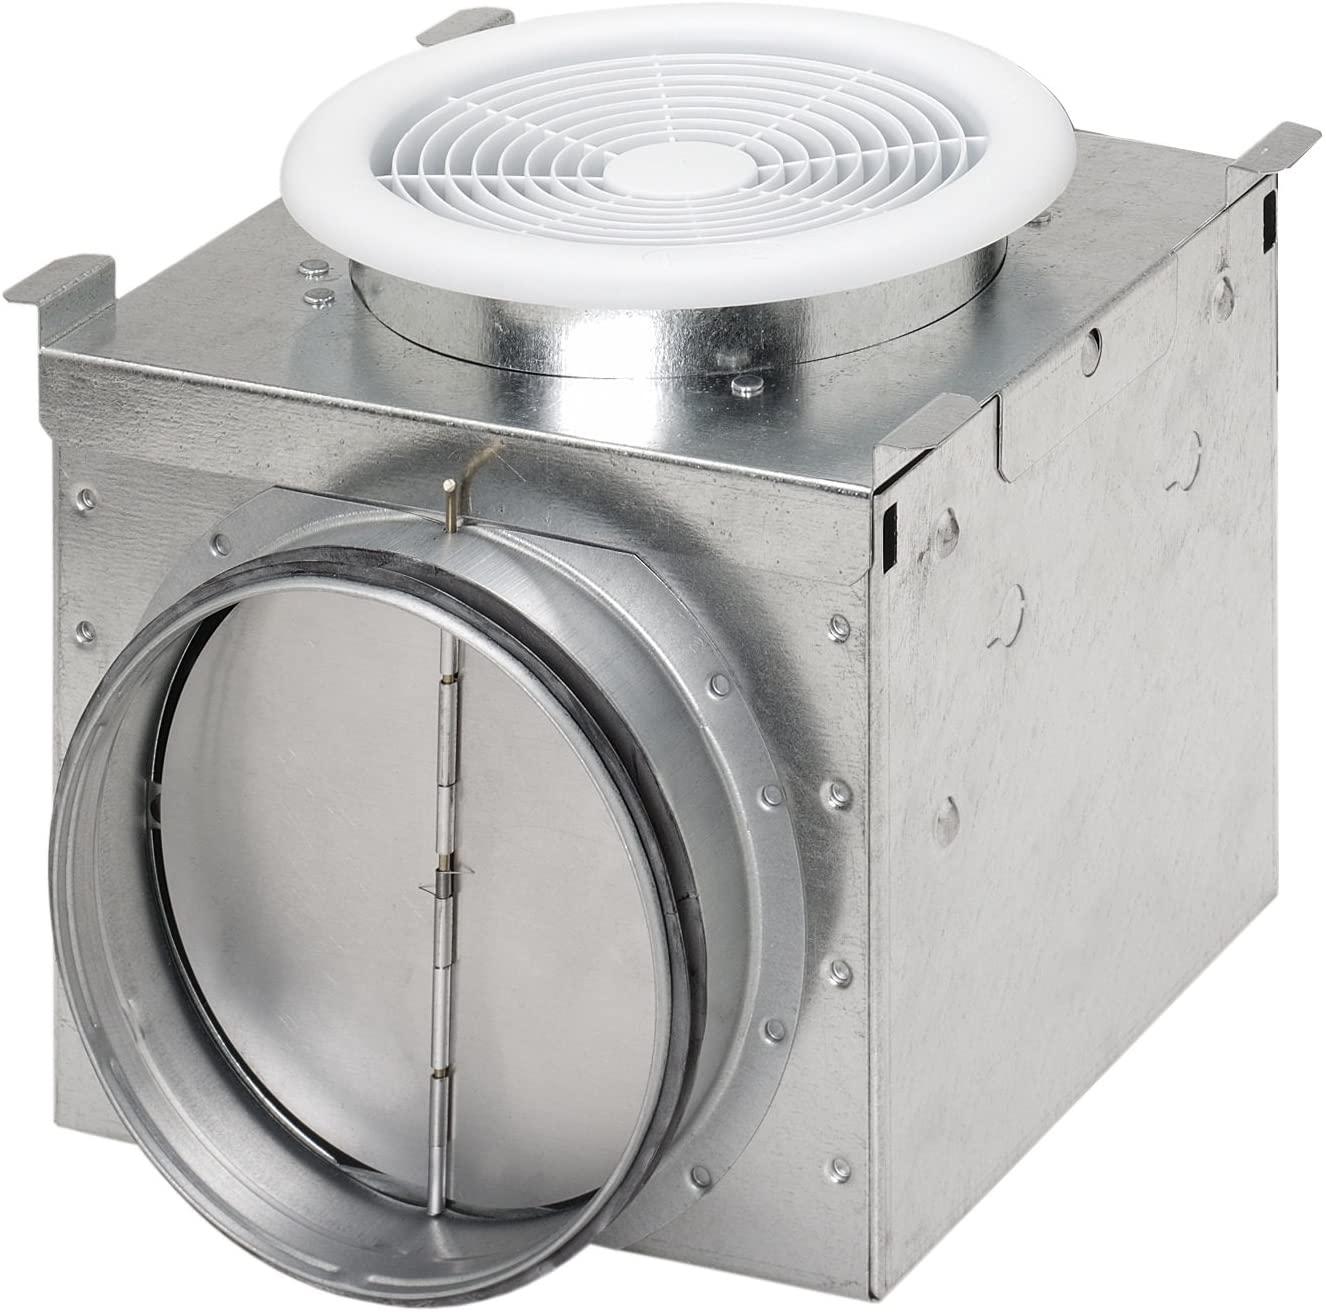 Systemair Fantech PBV6 Bath Fan Grill, 7